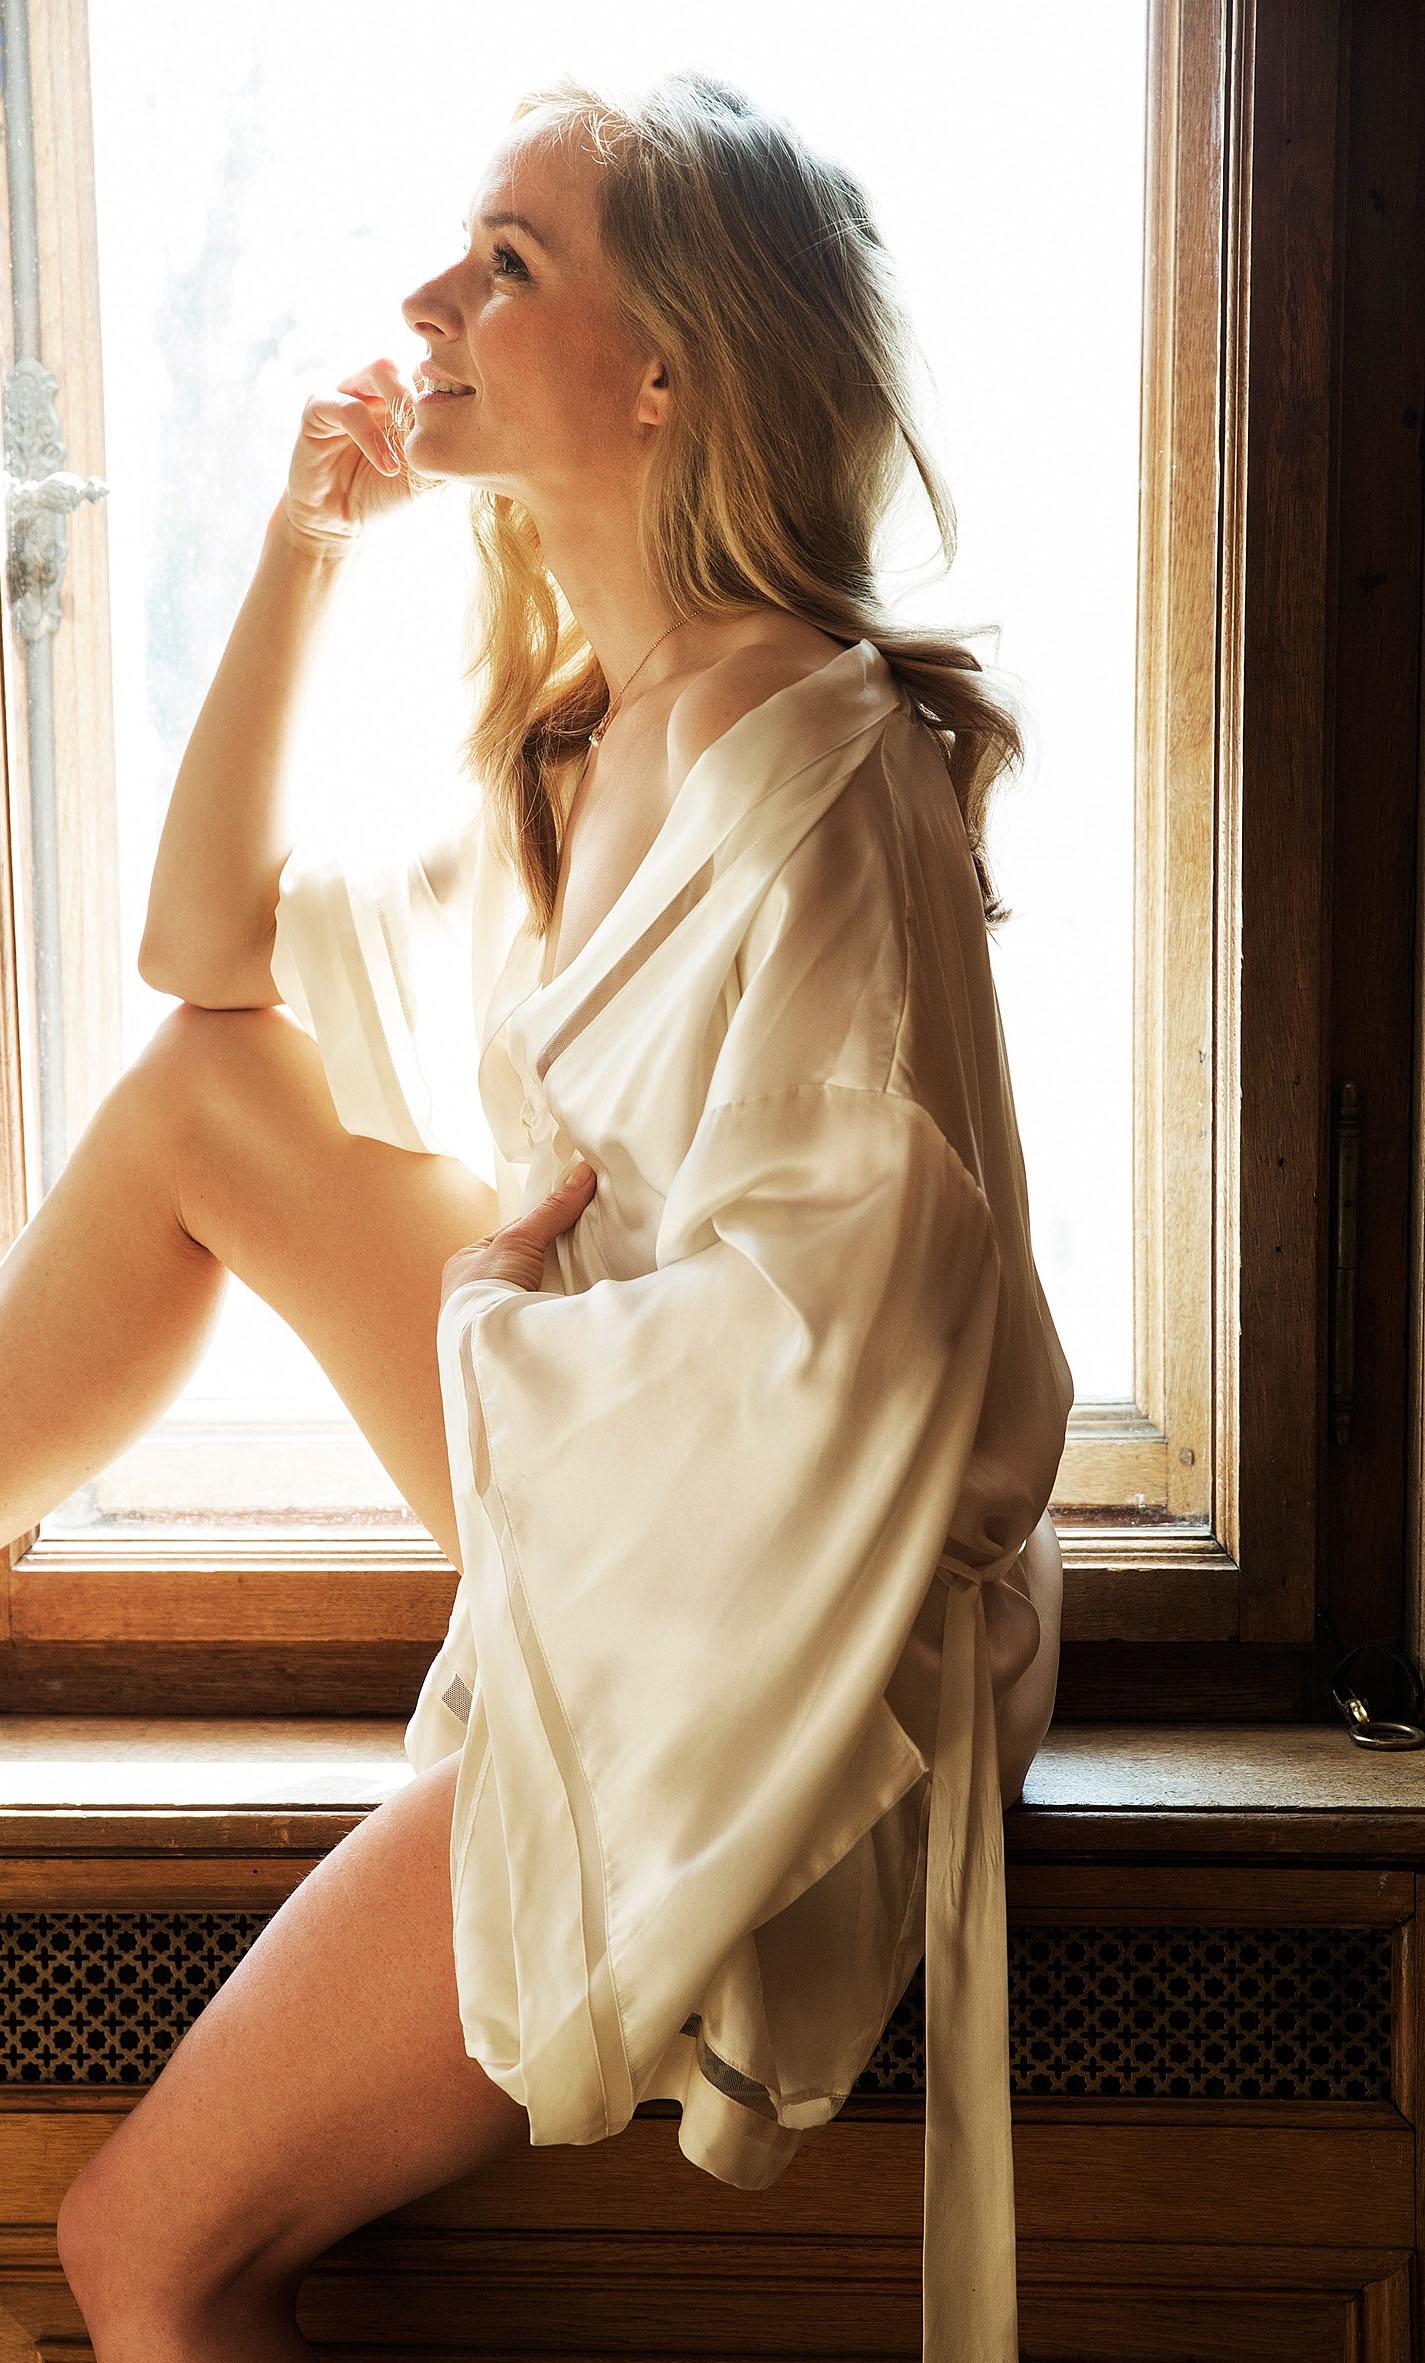 Аннет Фляйшер голая. Фото - 1